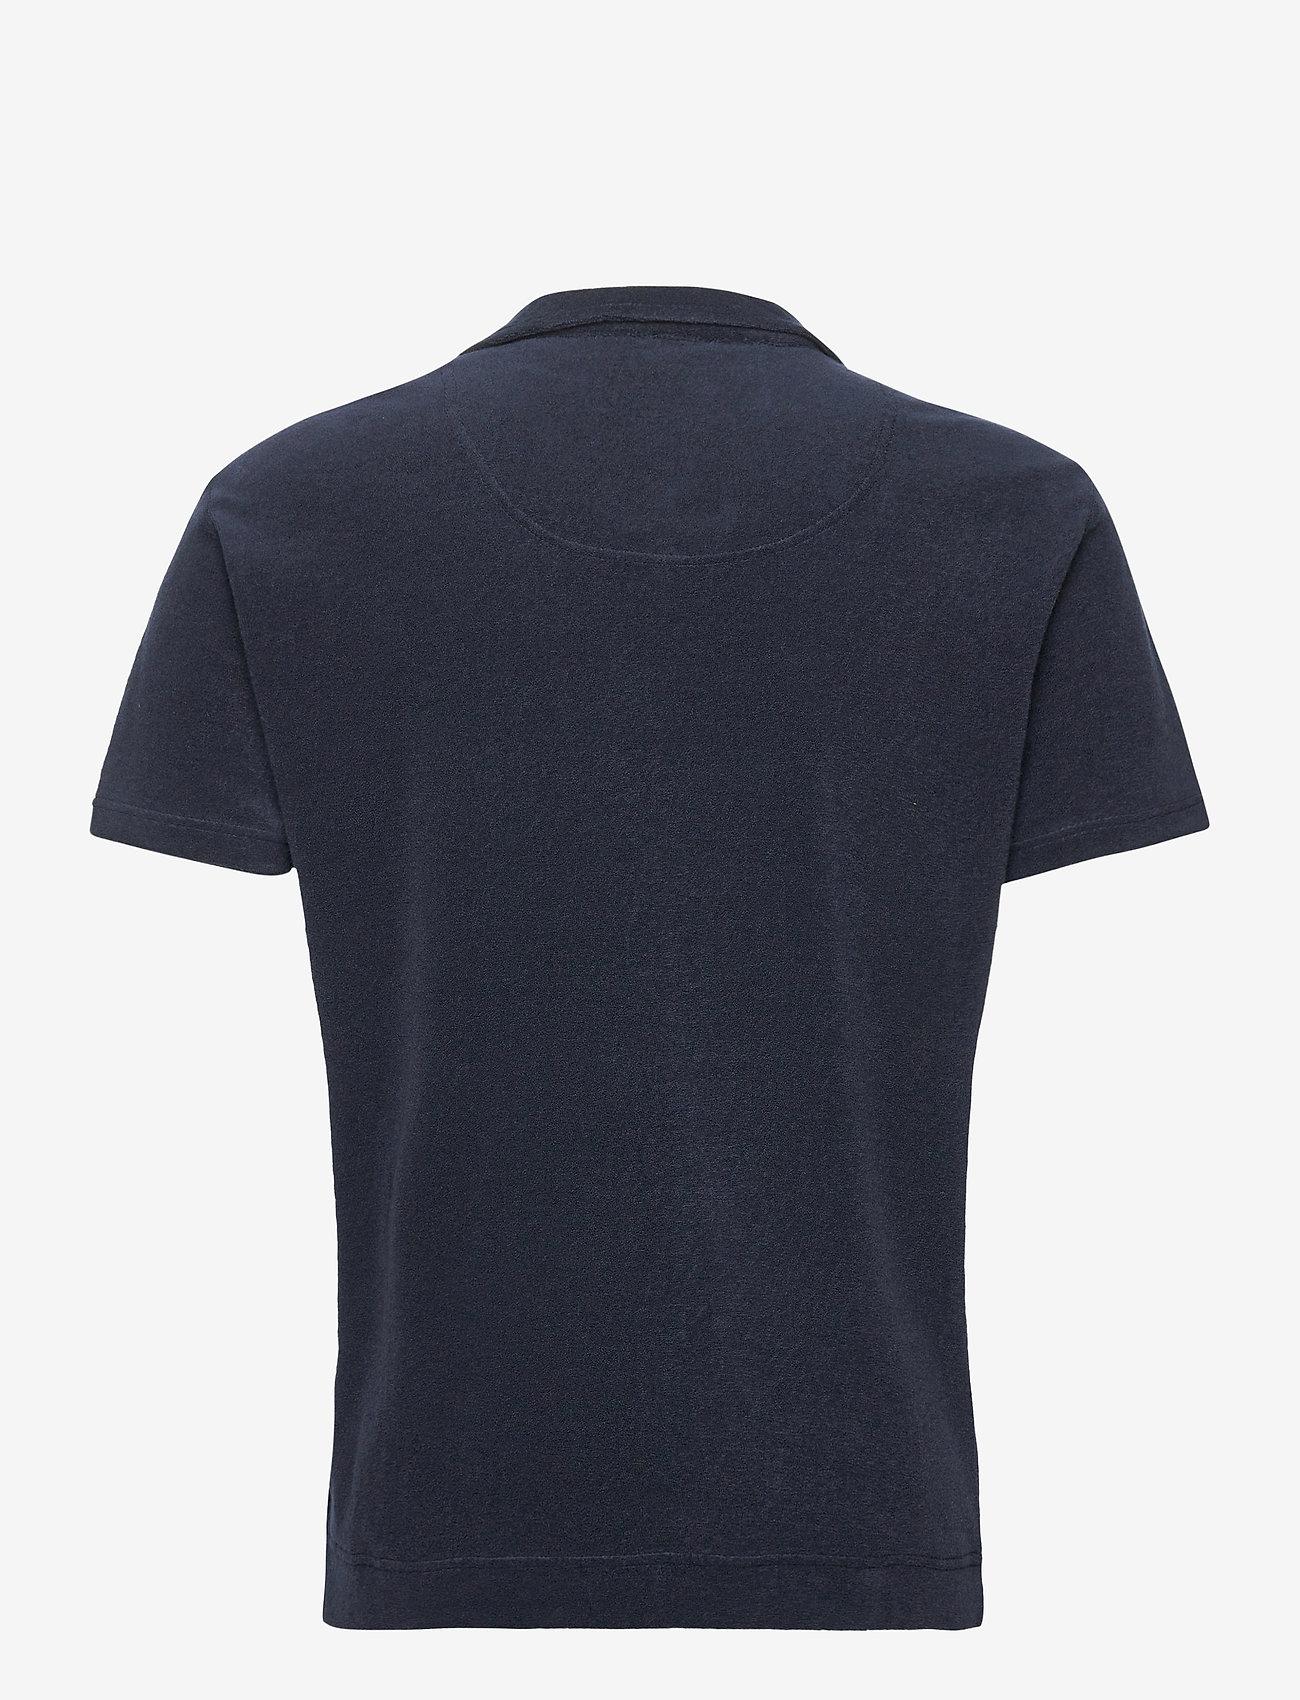 OAS - Solid Navy Terry Shirt - korte mouwen - blue - 1